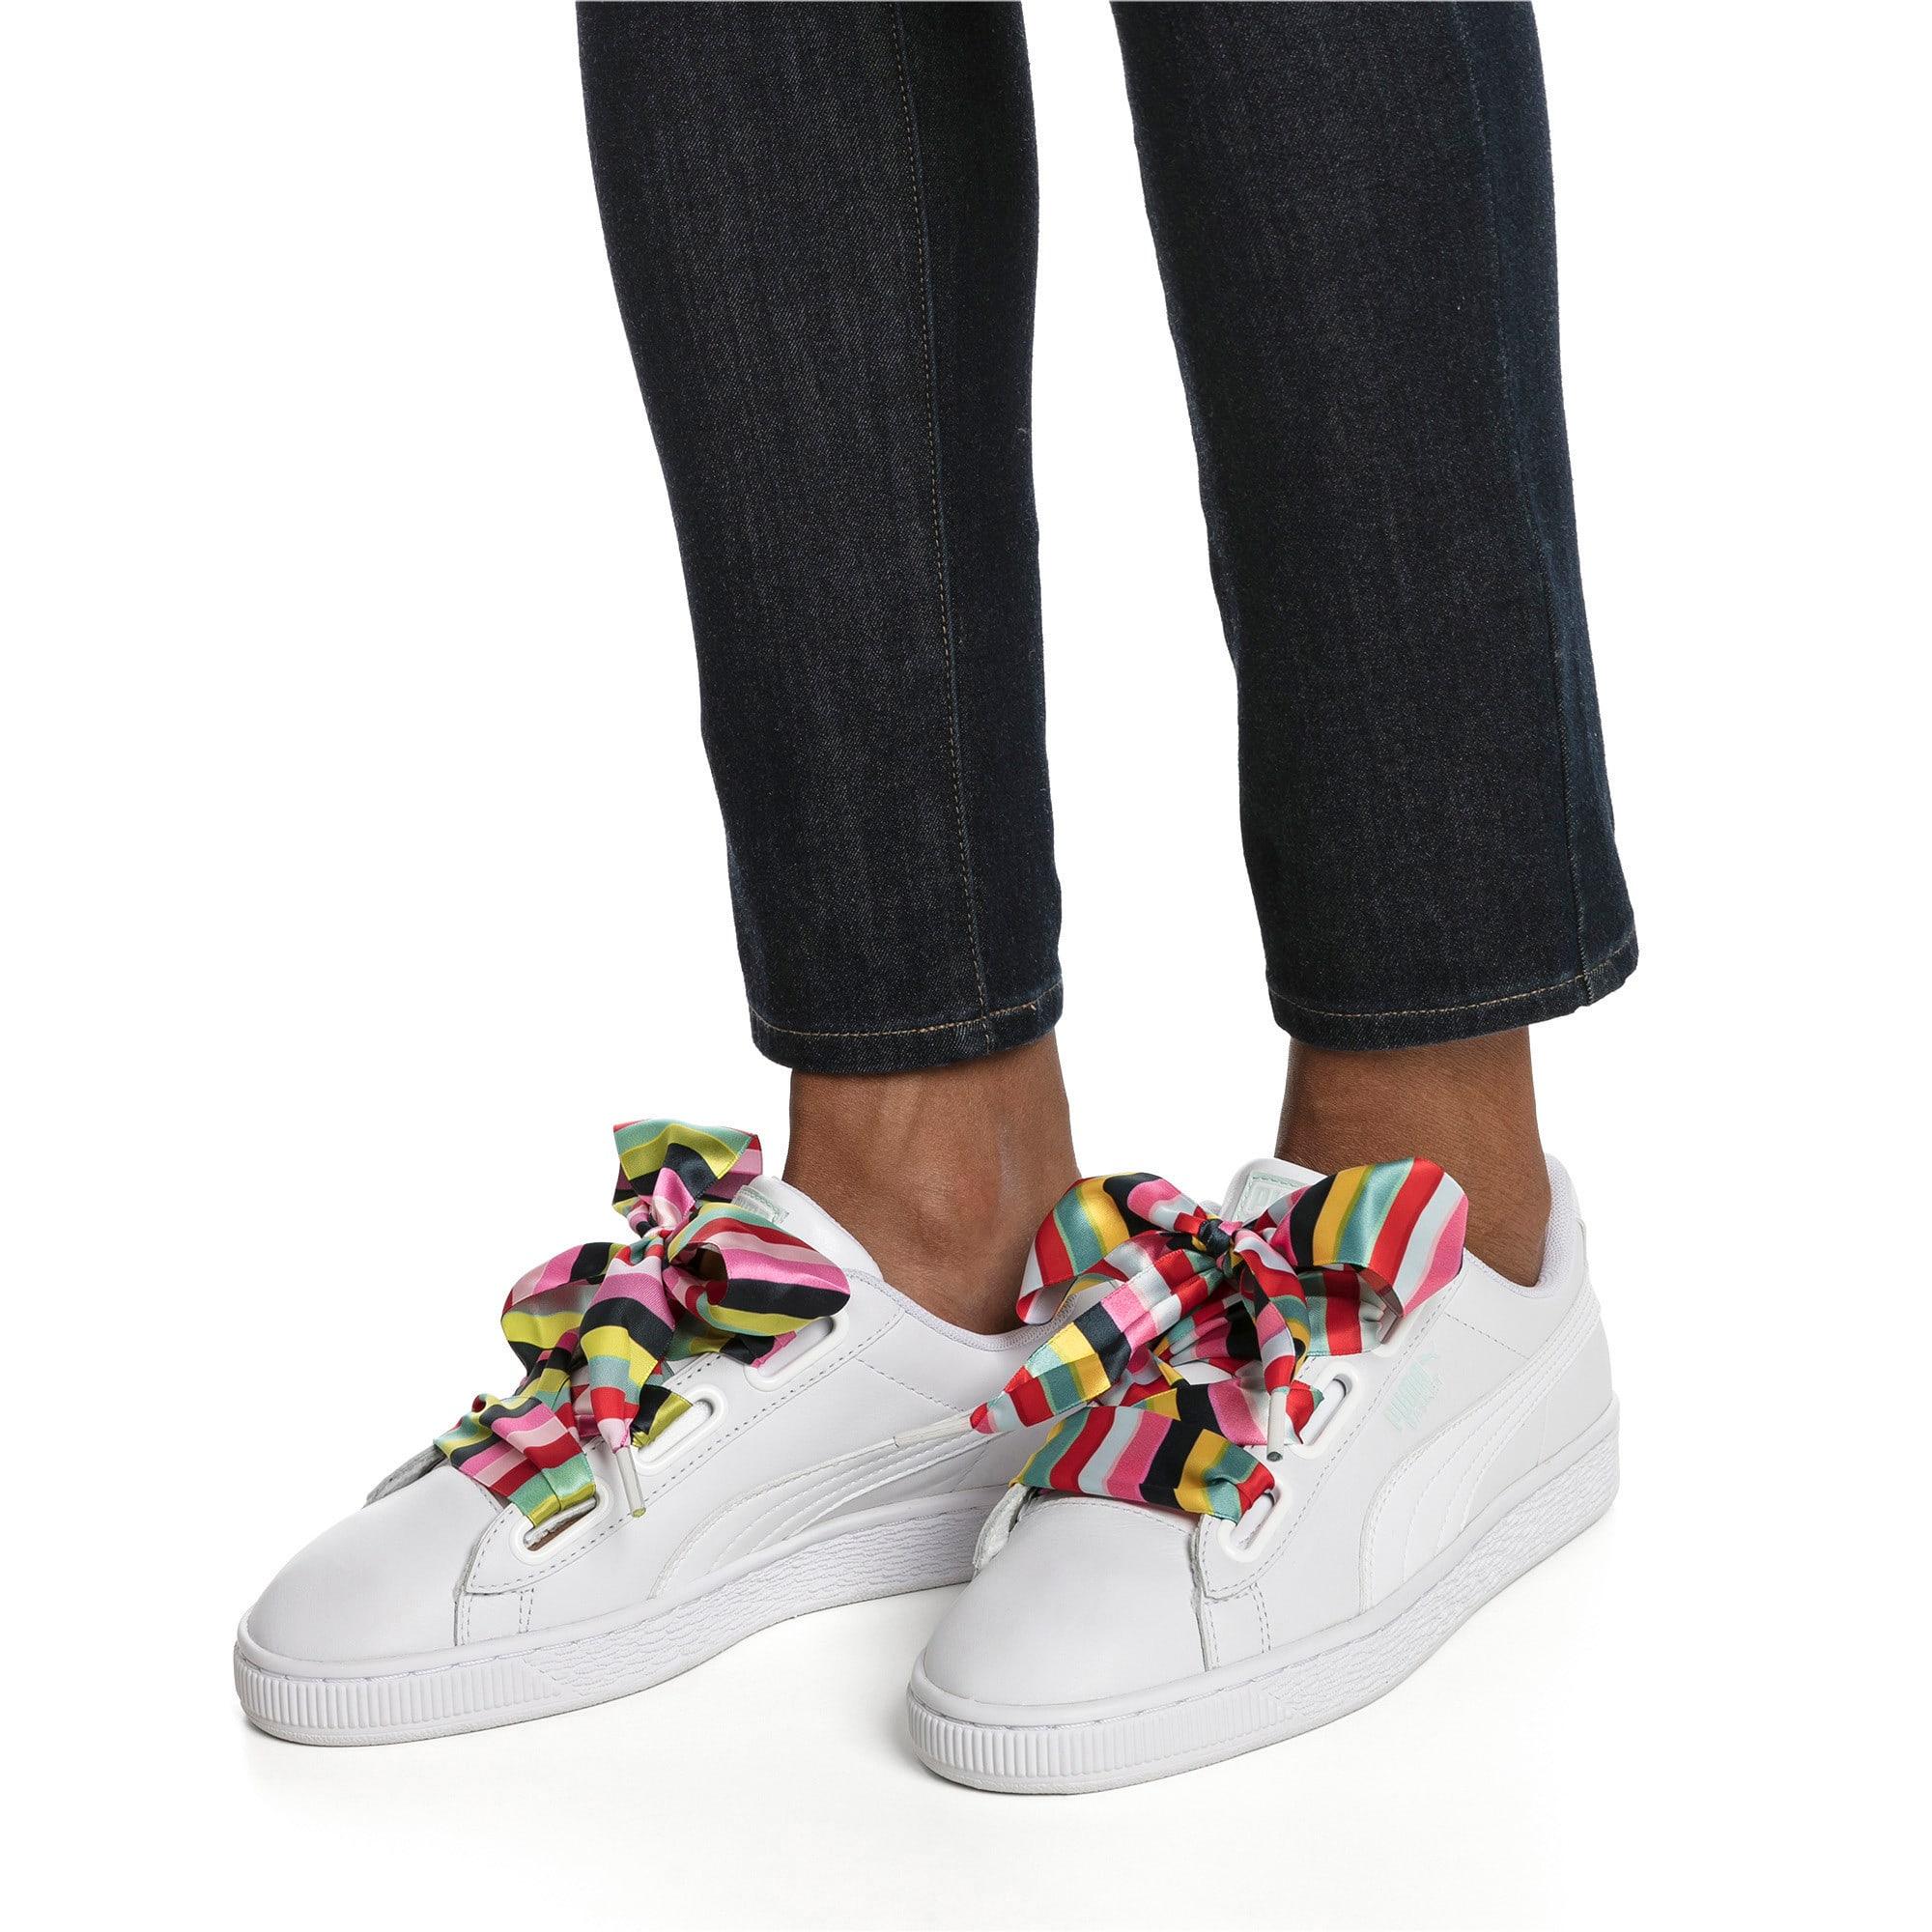 Thumbnail 2 of Basket Heart Gen Hustle Women's Sneakers, Puma White-Fair Aqua, medium-IND